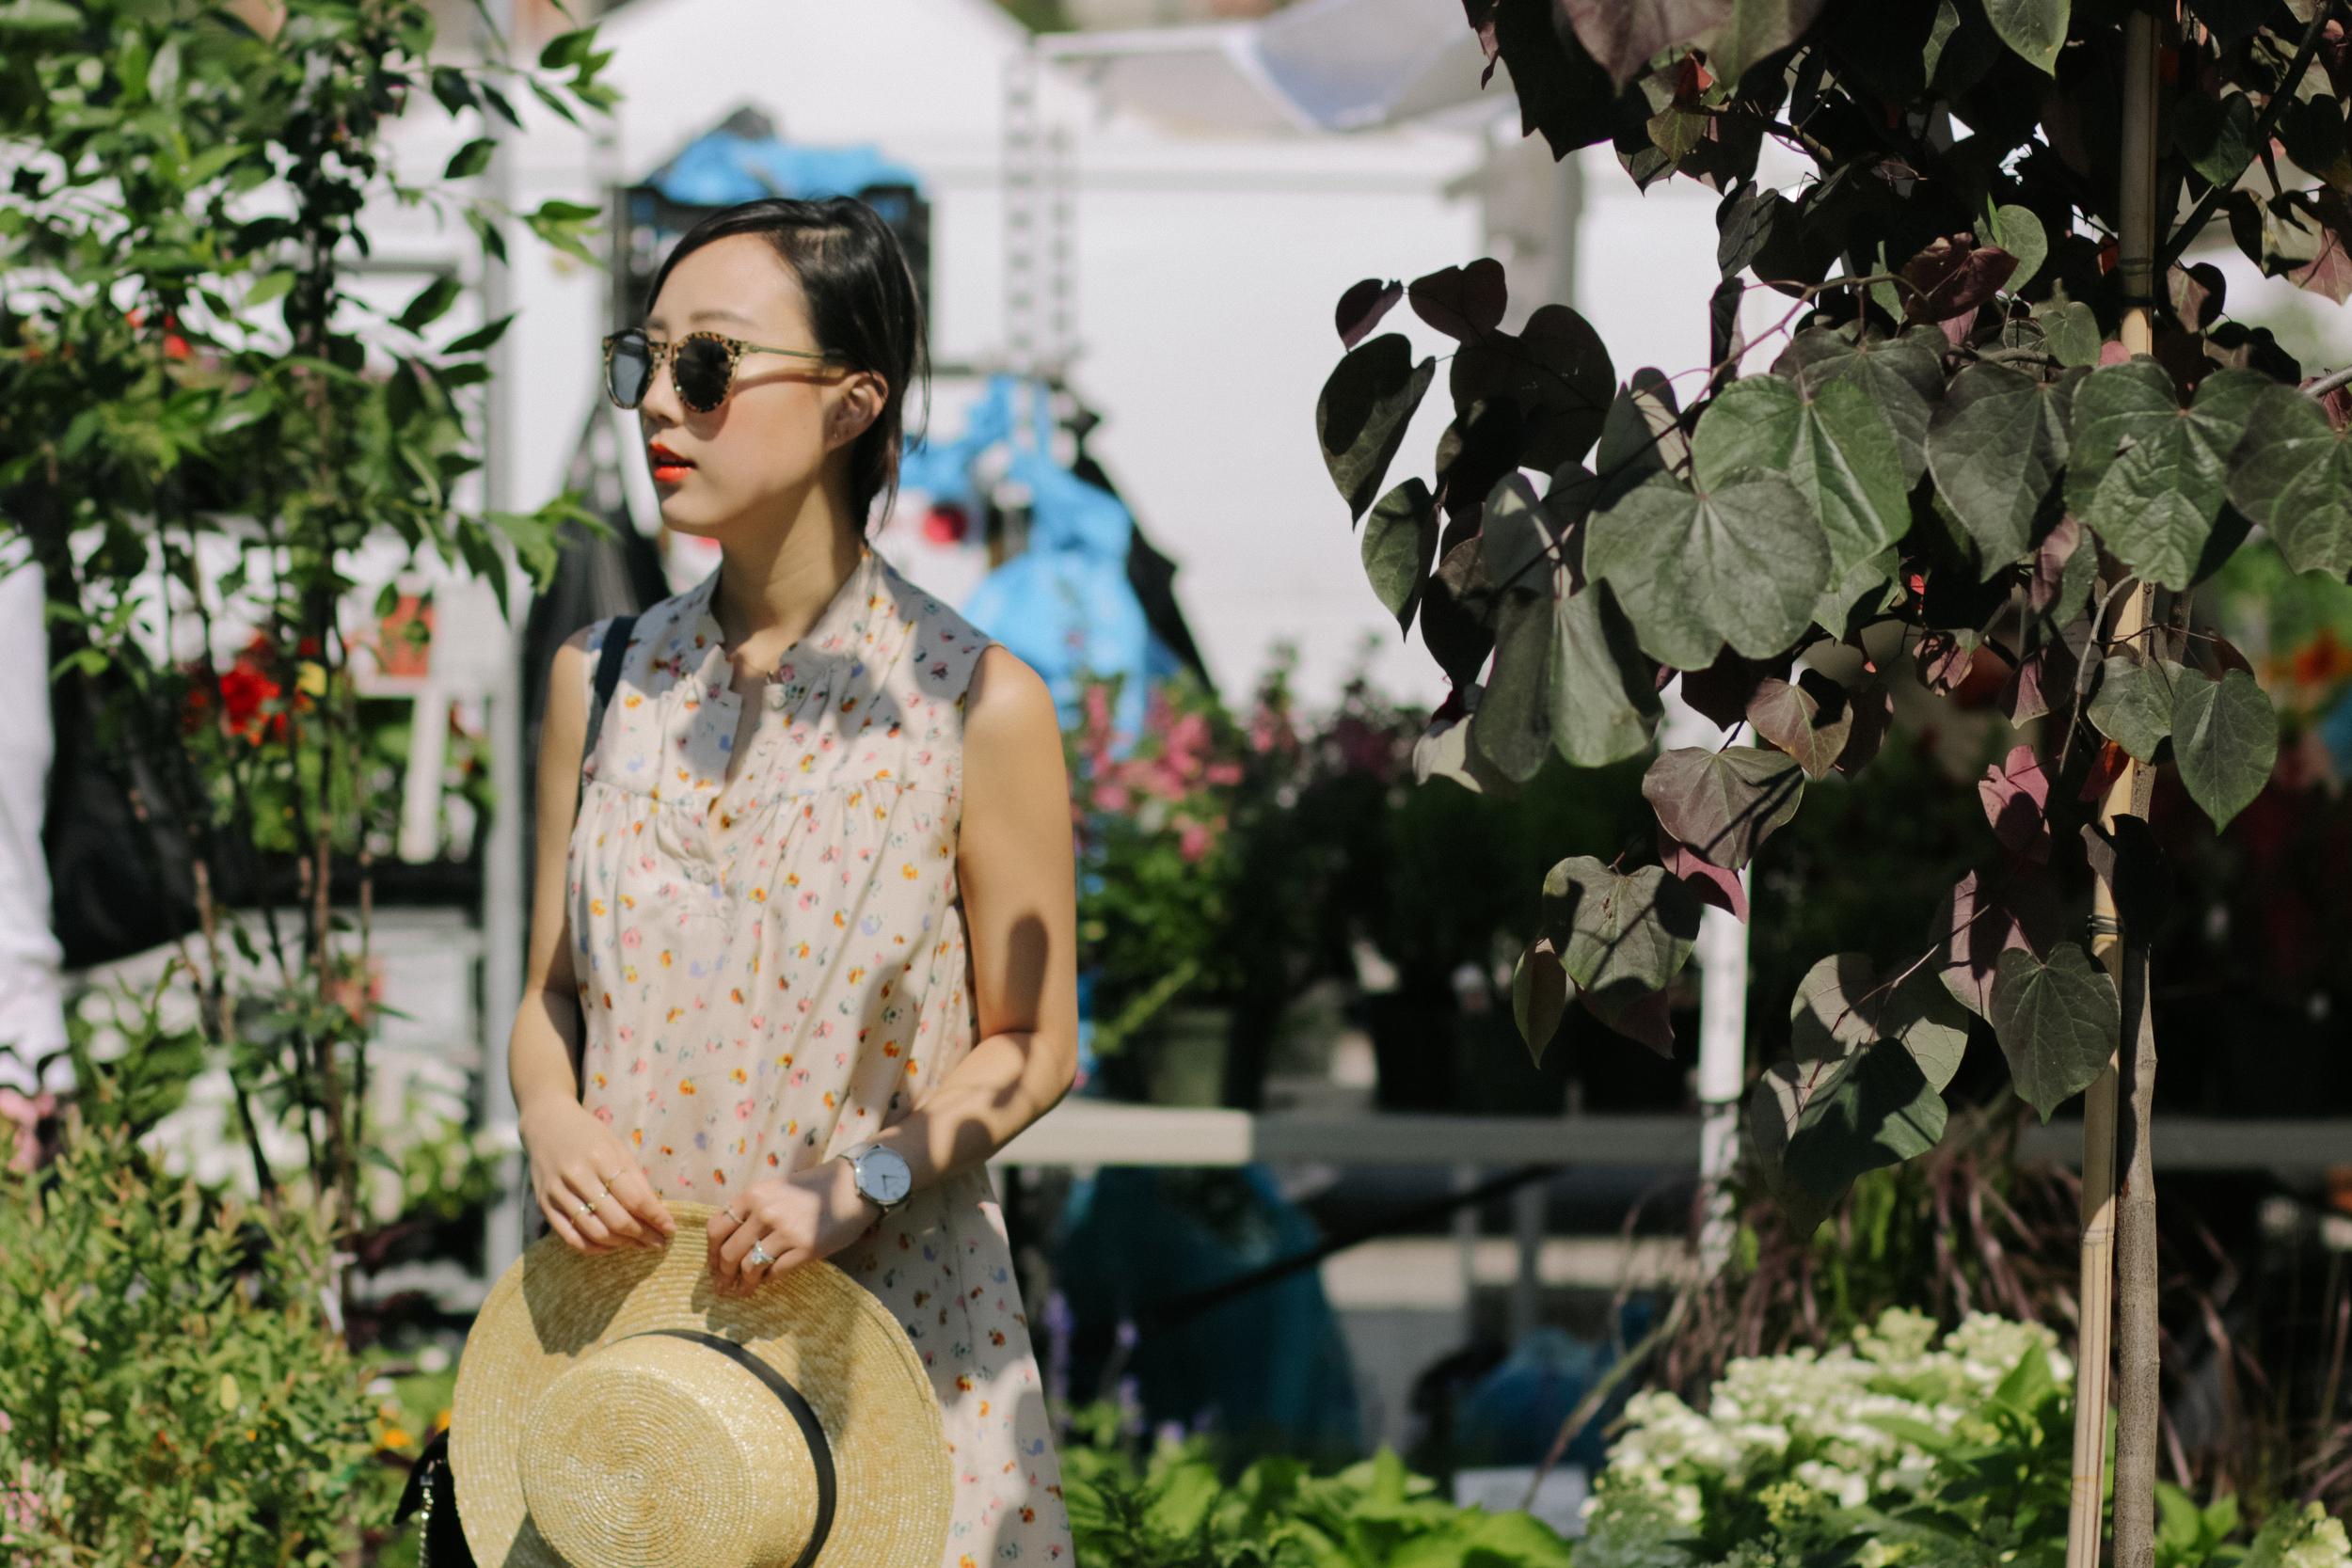 Xperio UV™ polarized sun lenses ,  Illesteva Frames , Girl. Band of Outsiders Dress,  Janessa Leone Hat ,  Larsson & Jennings Watch ,  Mirlo Jewelry ,  Chosungah 22   Lip Color